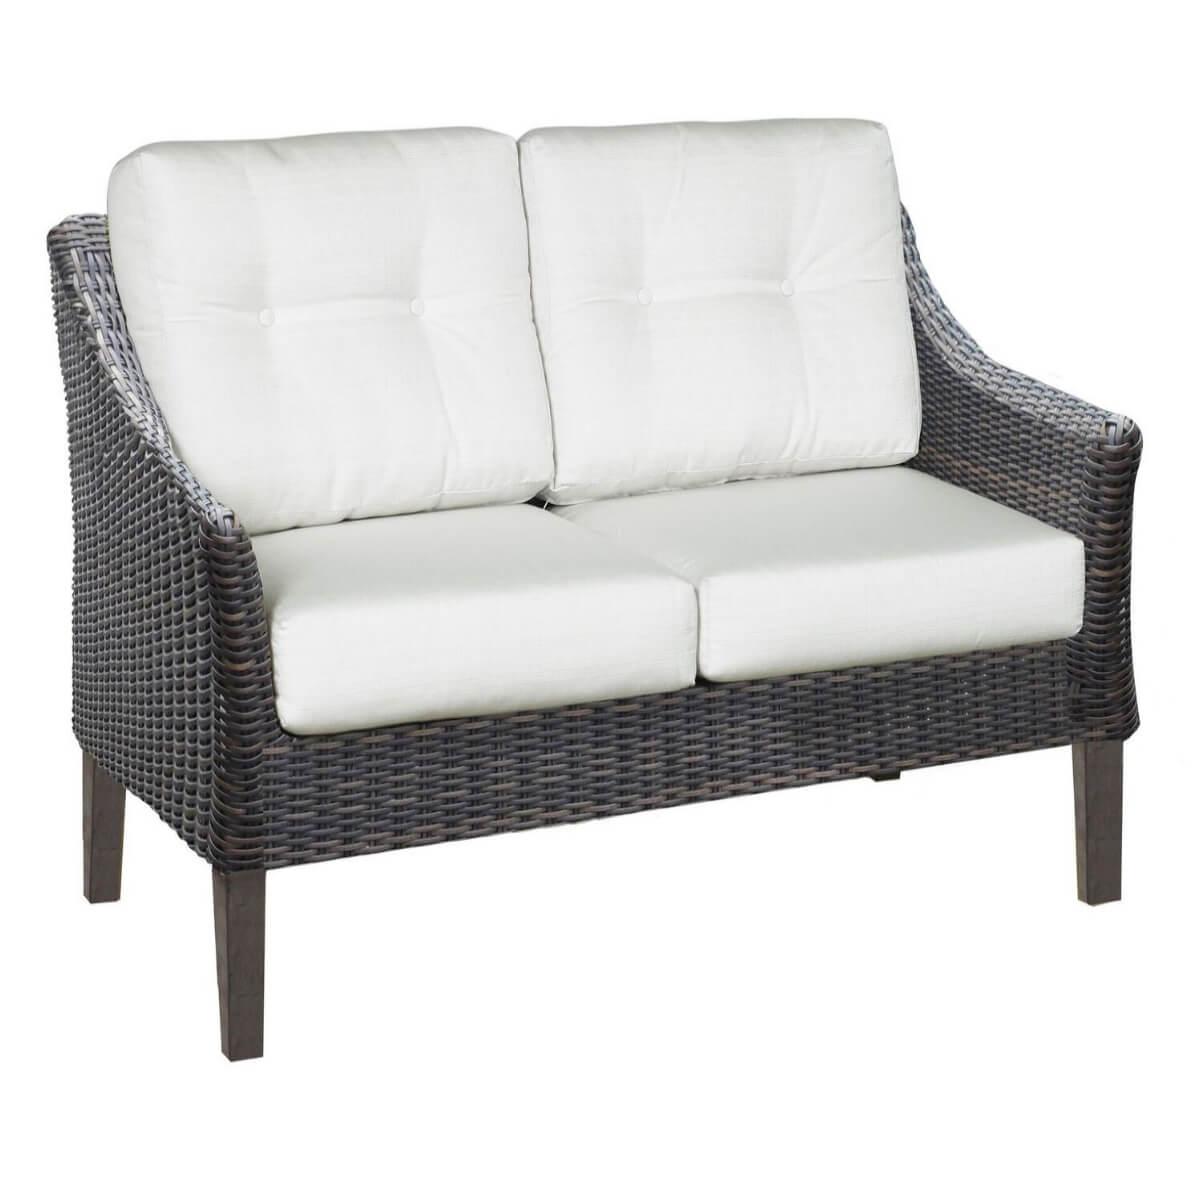 San Marino Outdoor Patio Furniture Loveseat  PatioHQ